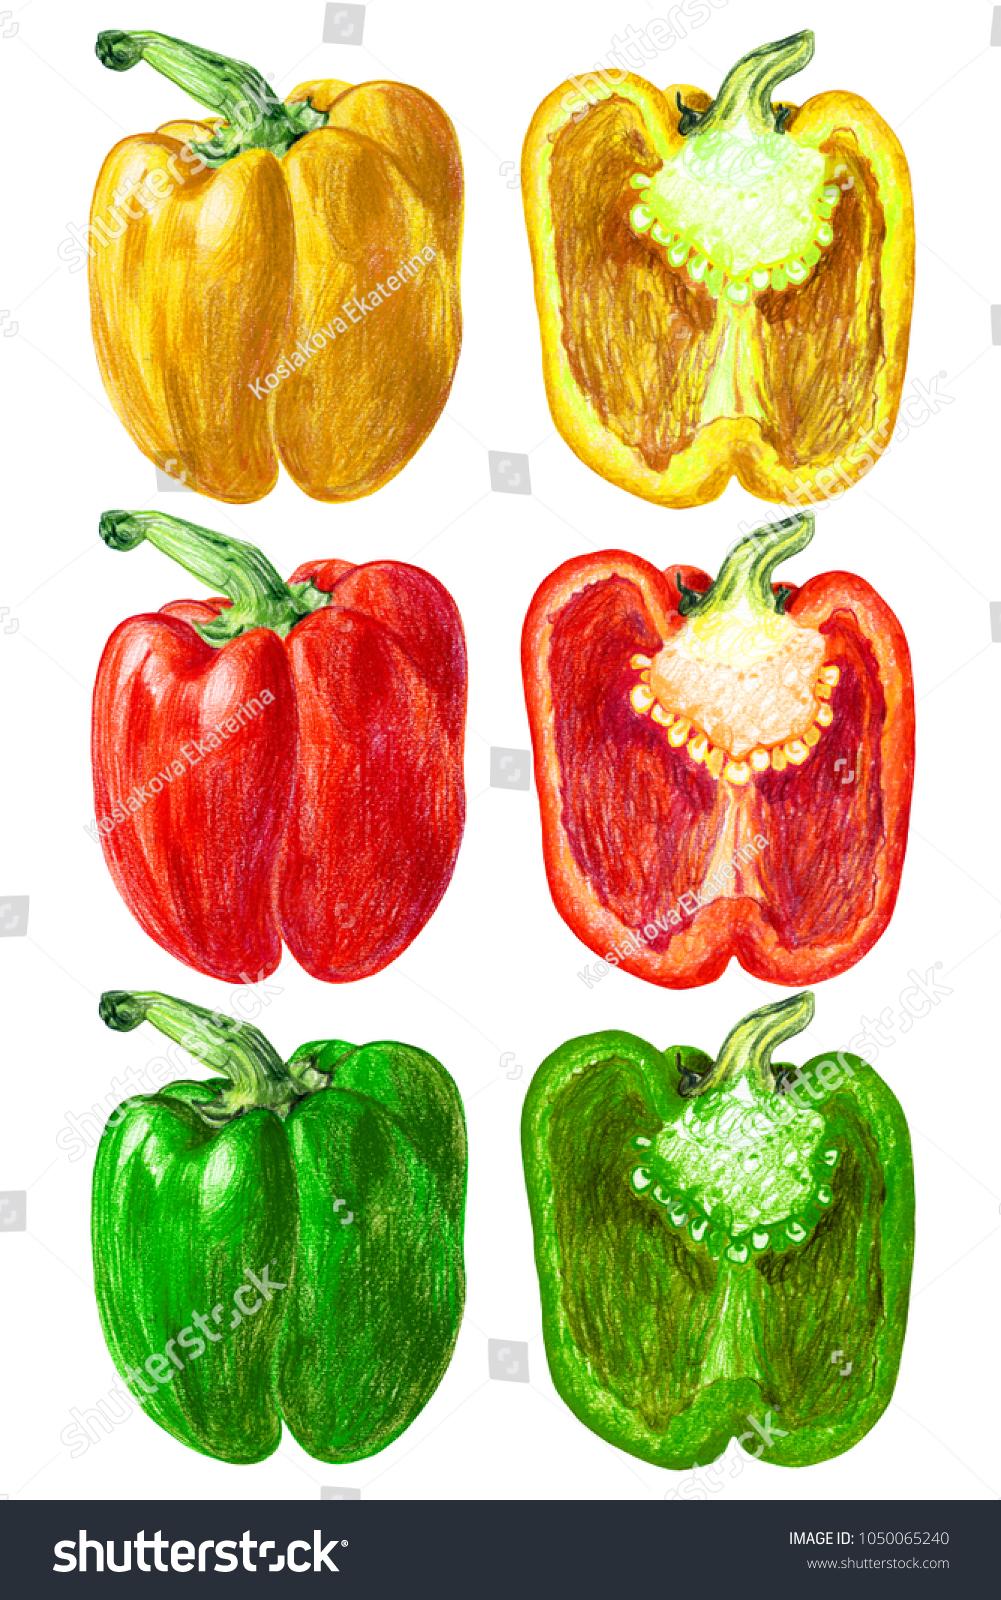 Enchanting Green Colored Fruits Ideas - Drawing Coloring ...